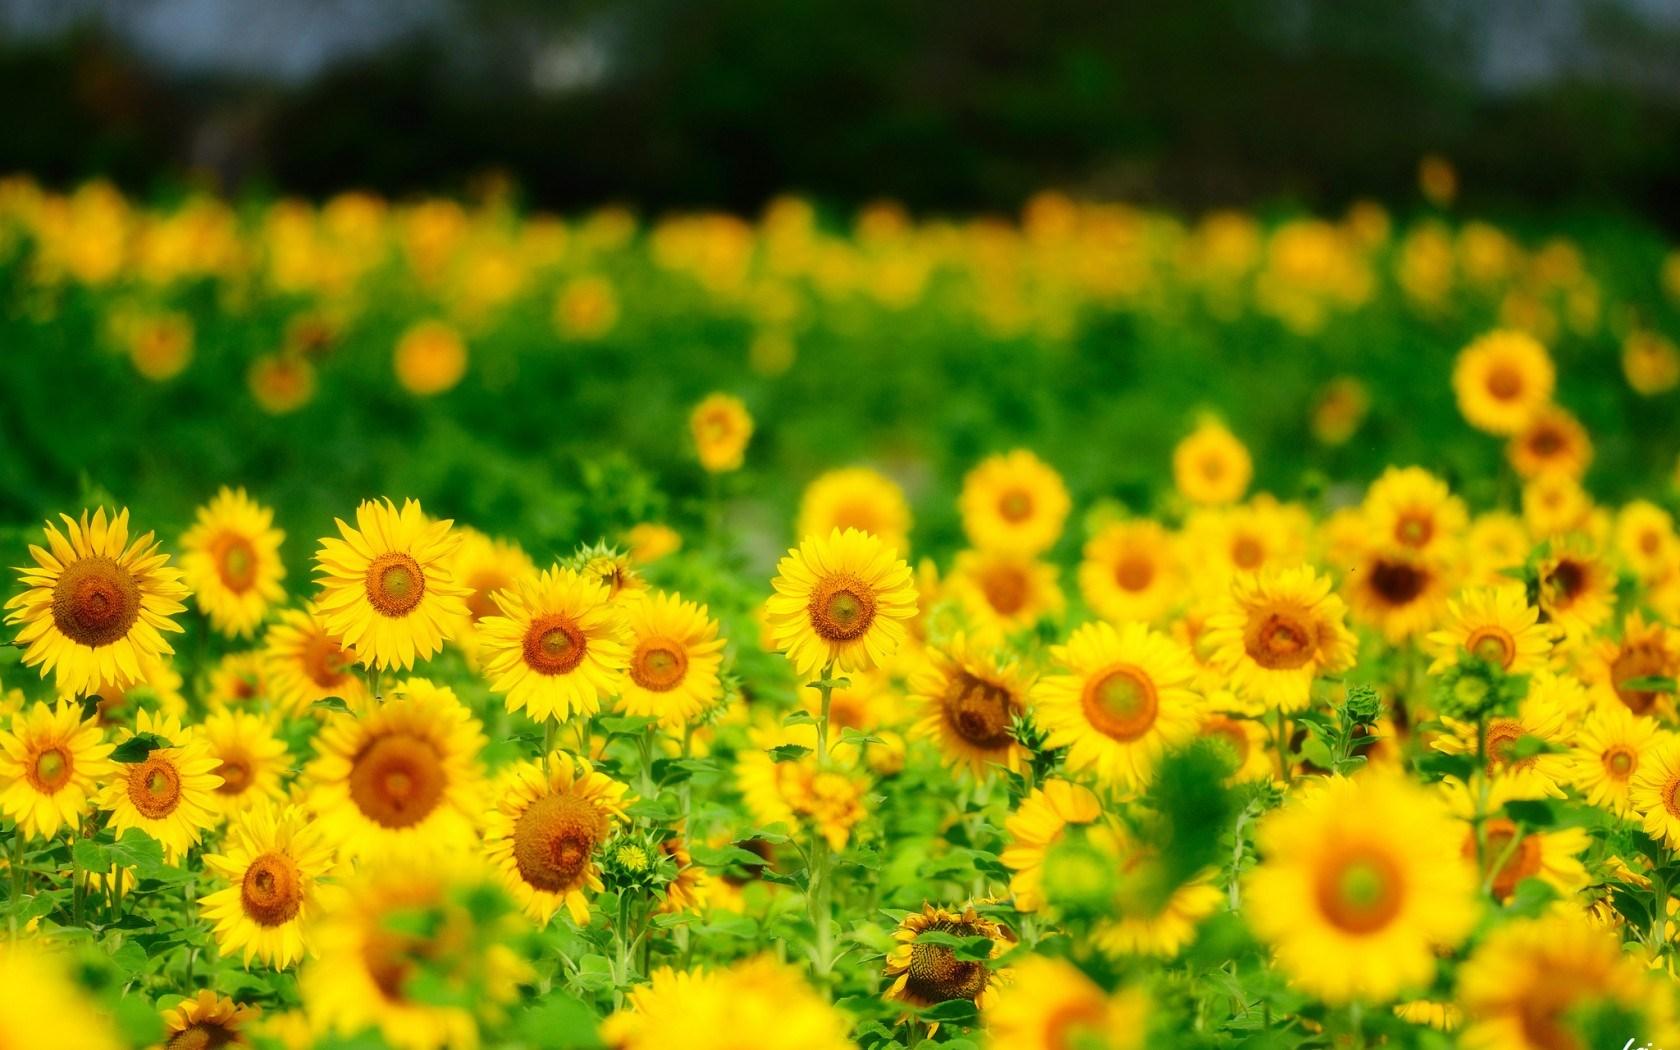 sunflowers-summer-nature-1